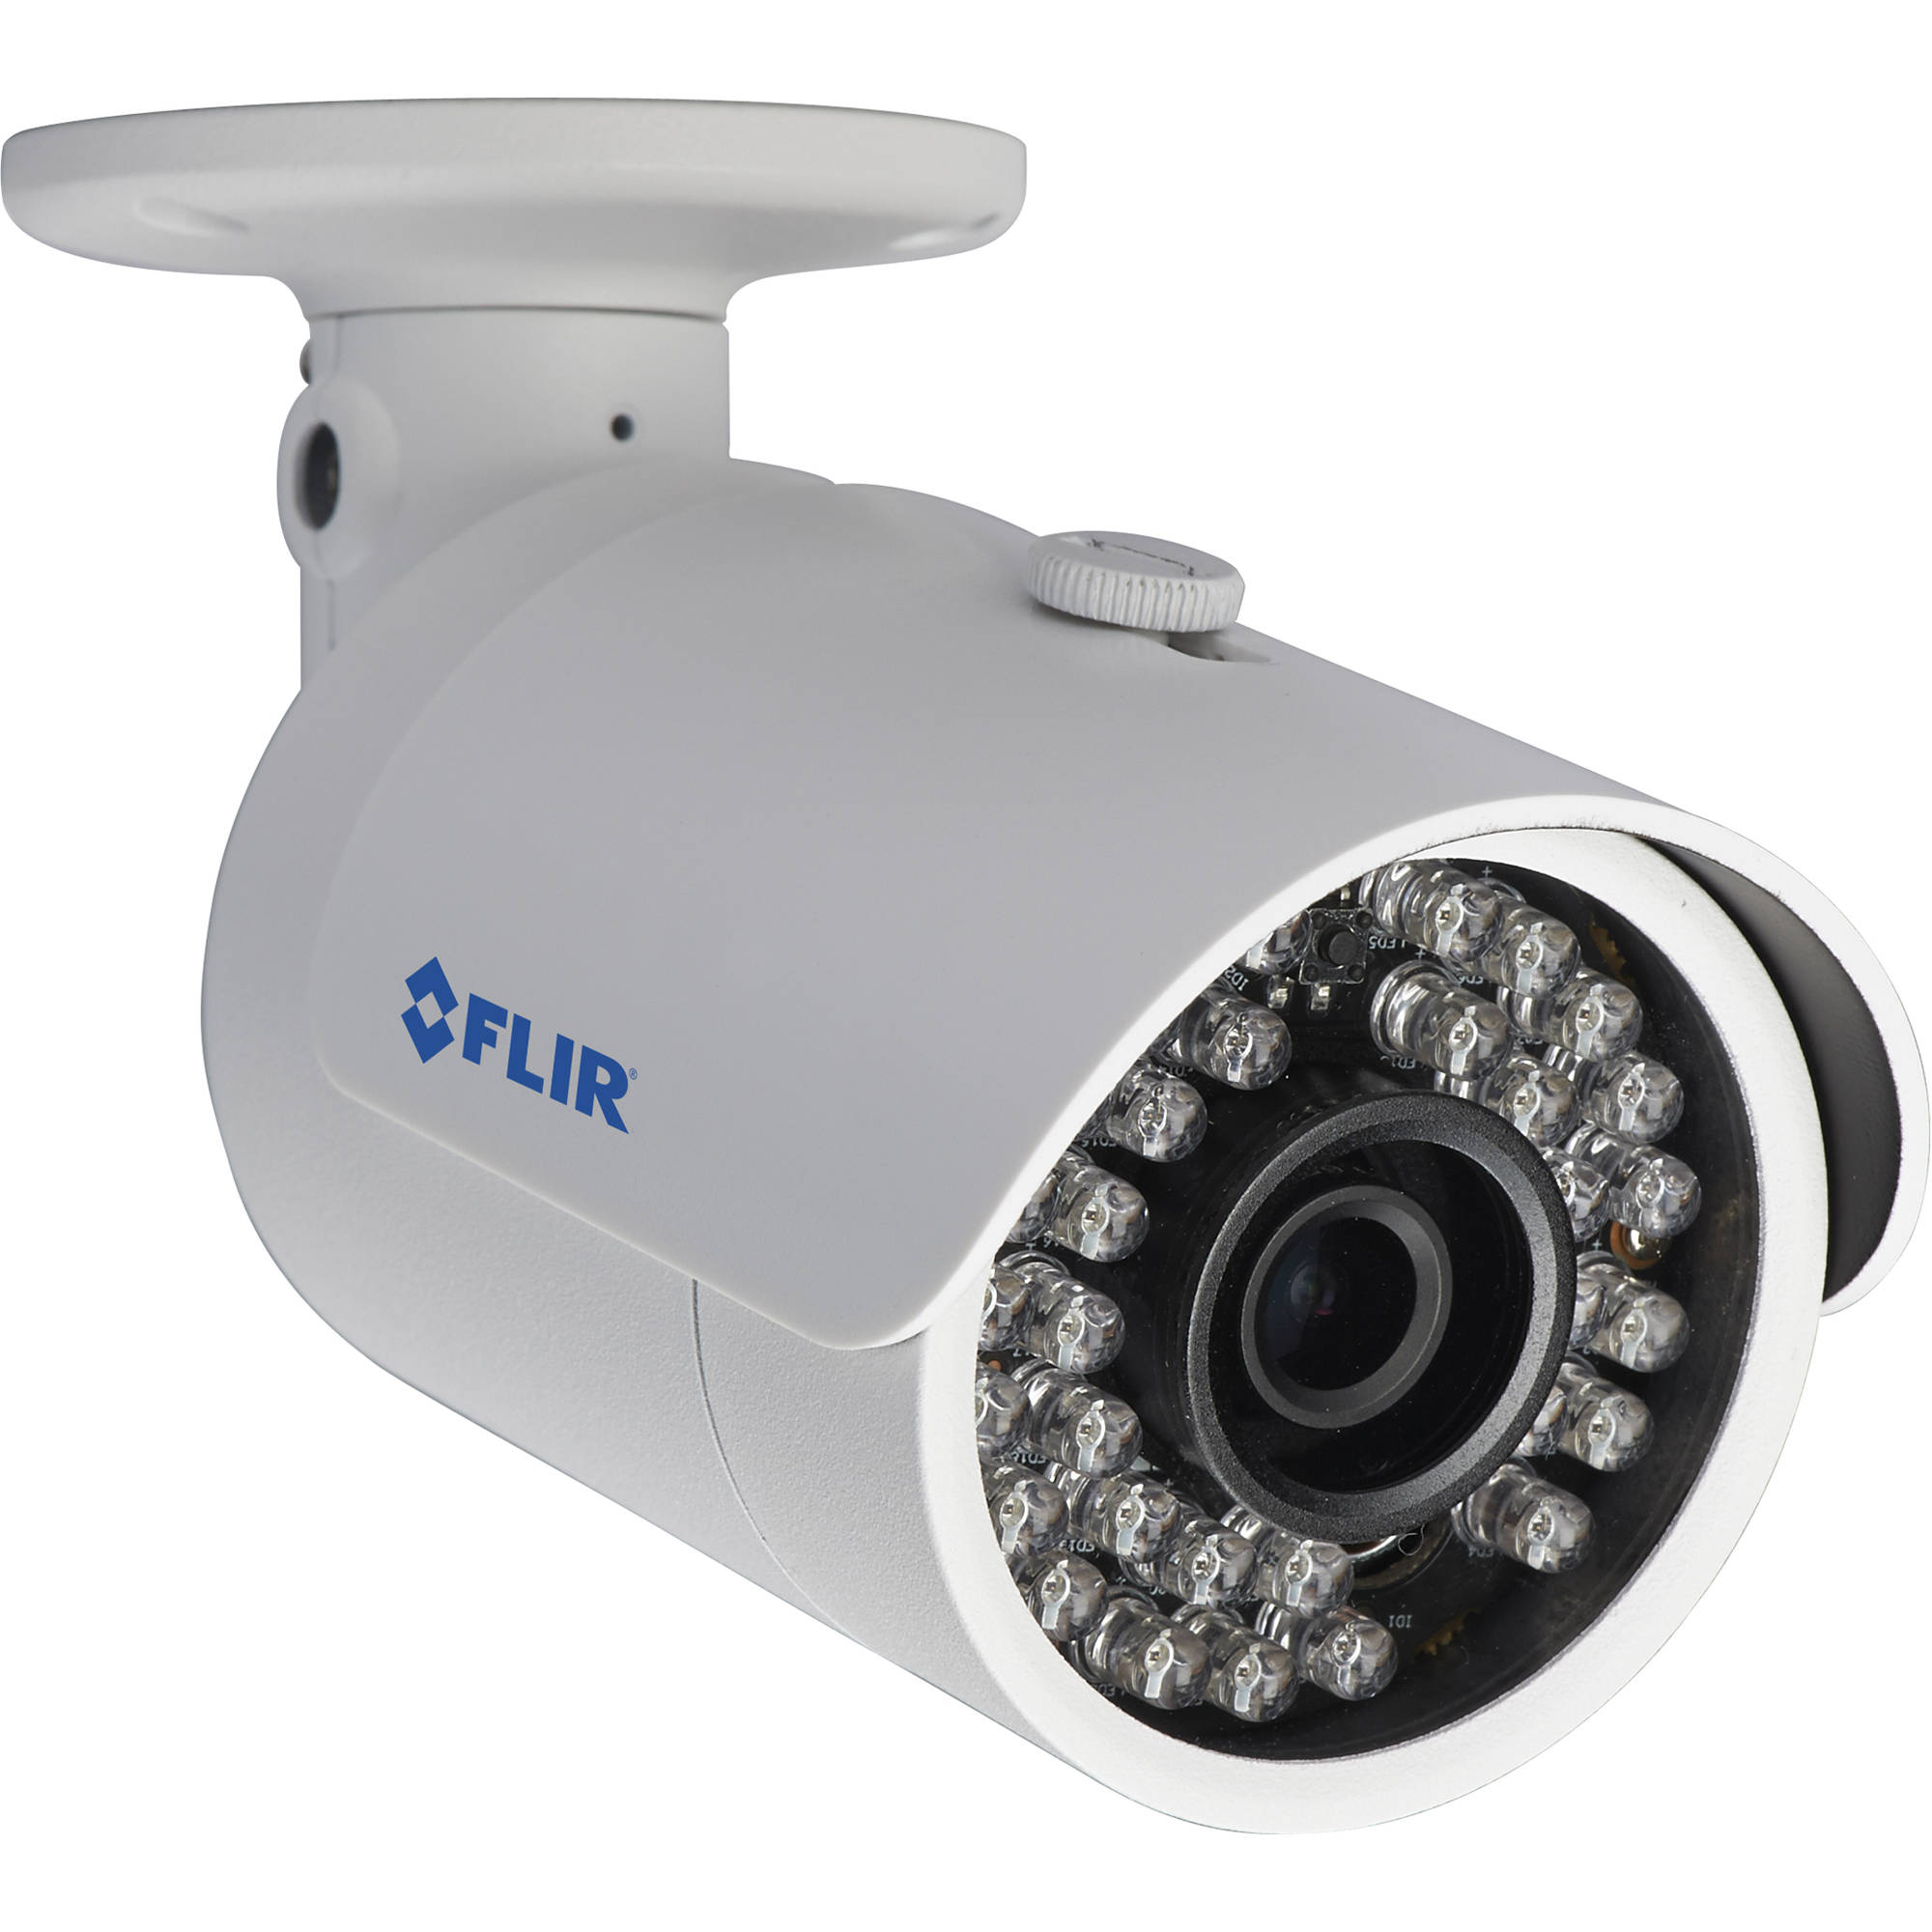 FLIR 2.1MP Day-Night IR Mini Bullet Camera with 3.6mm Fixed Lens - VDC Vandelta